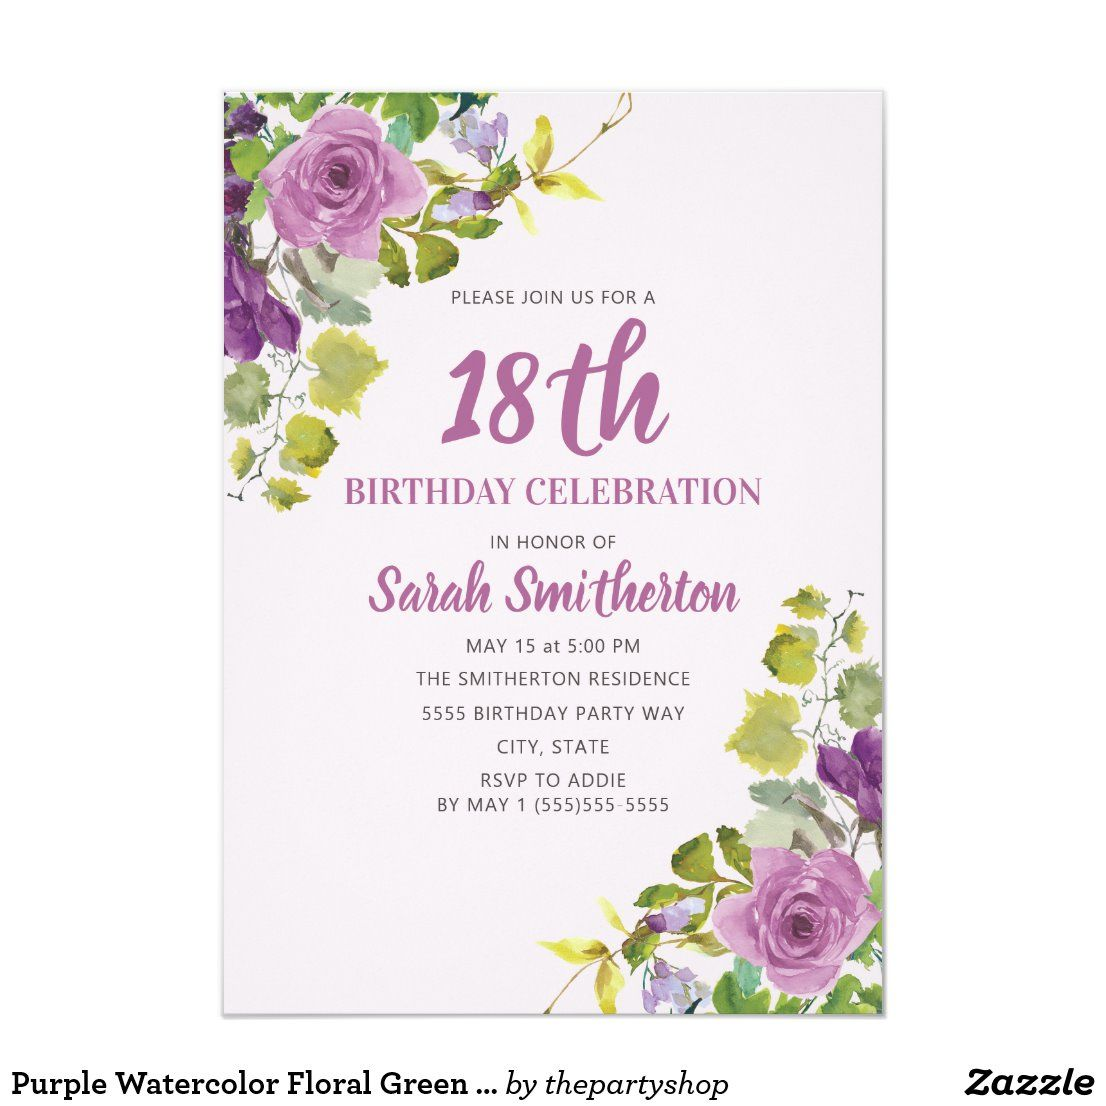 40 18th birthday party invitations